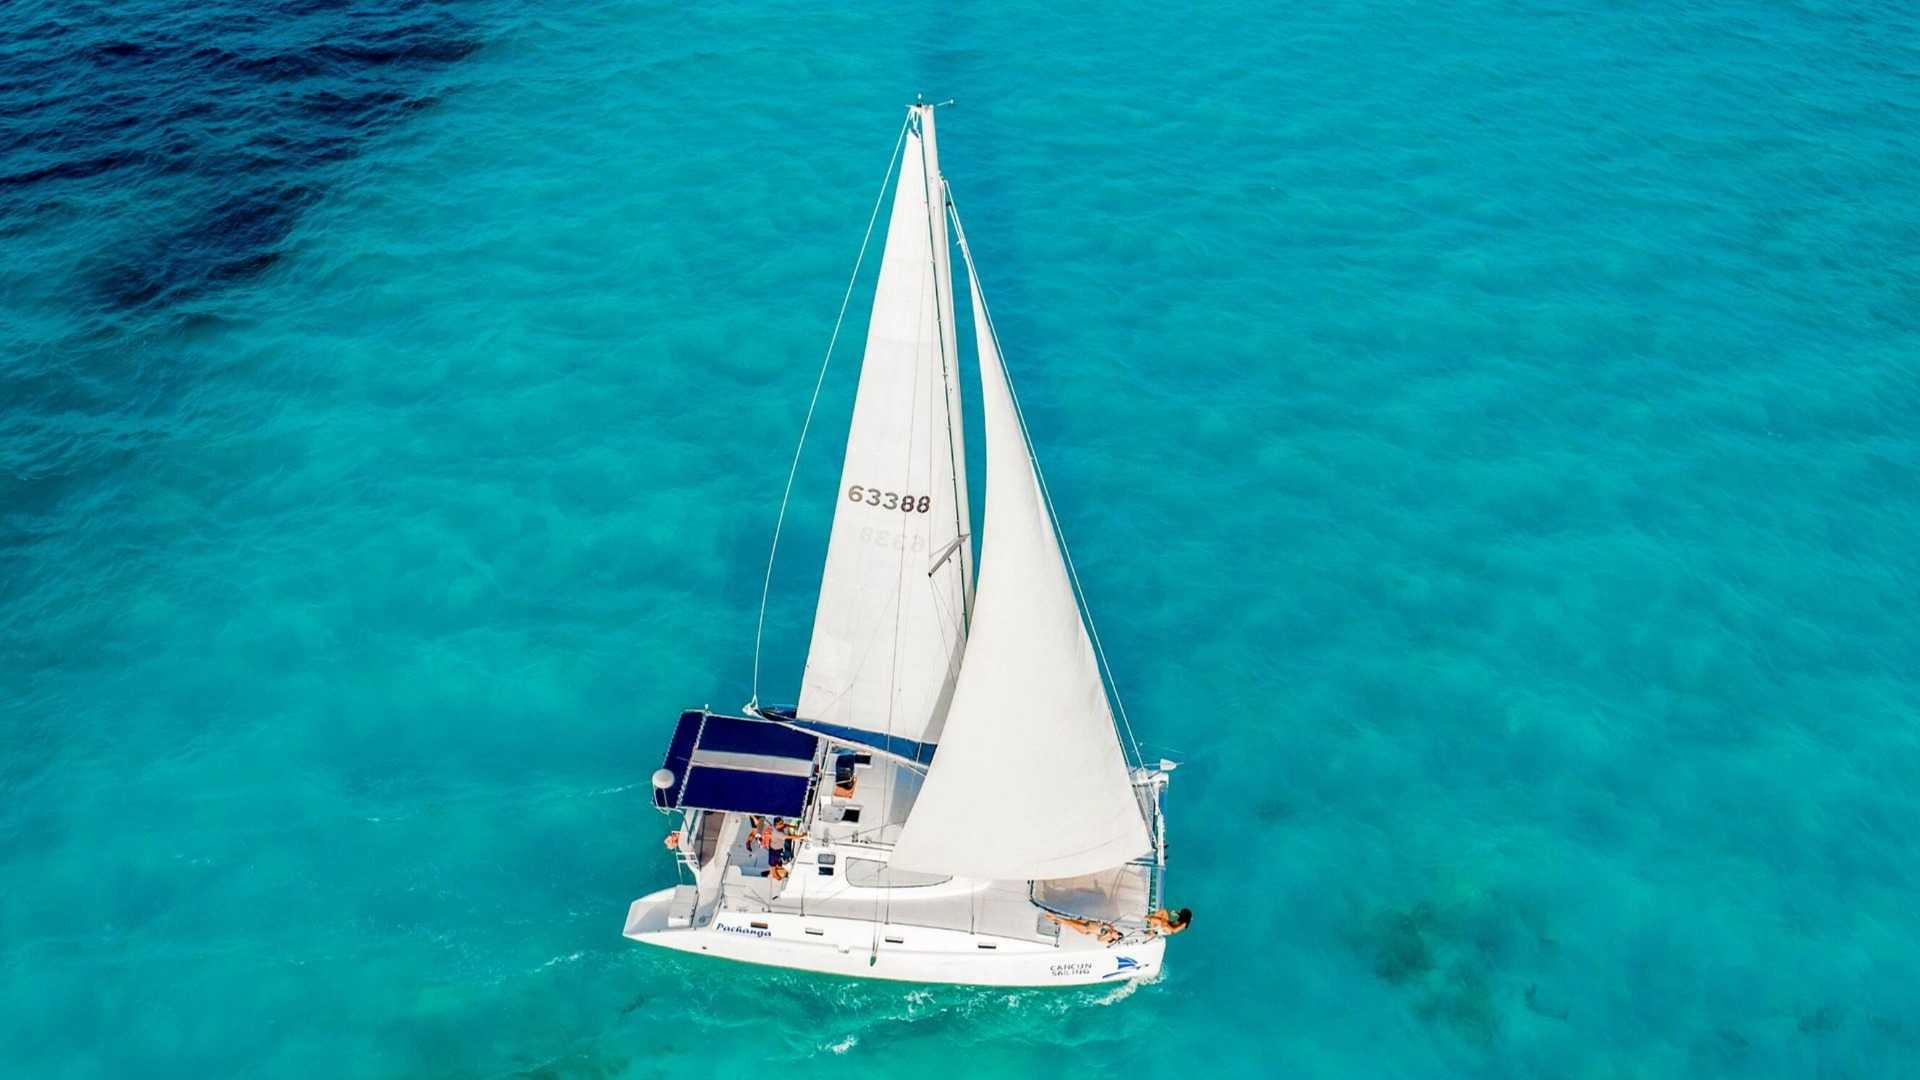 5 - LowRes - Pachanga - Private Isla Mujeres catamaran tour - Cancun Sailing